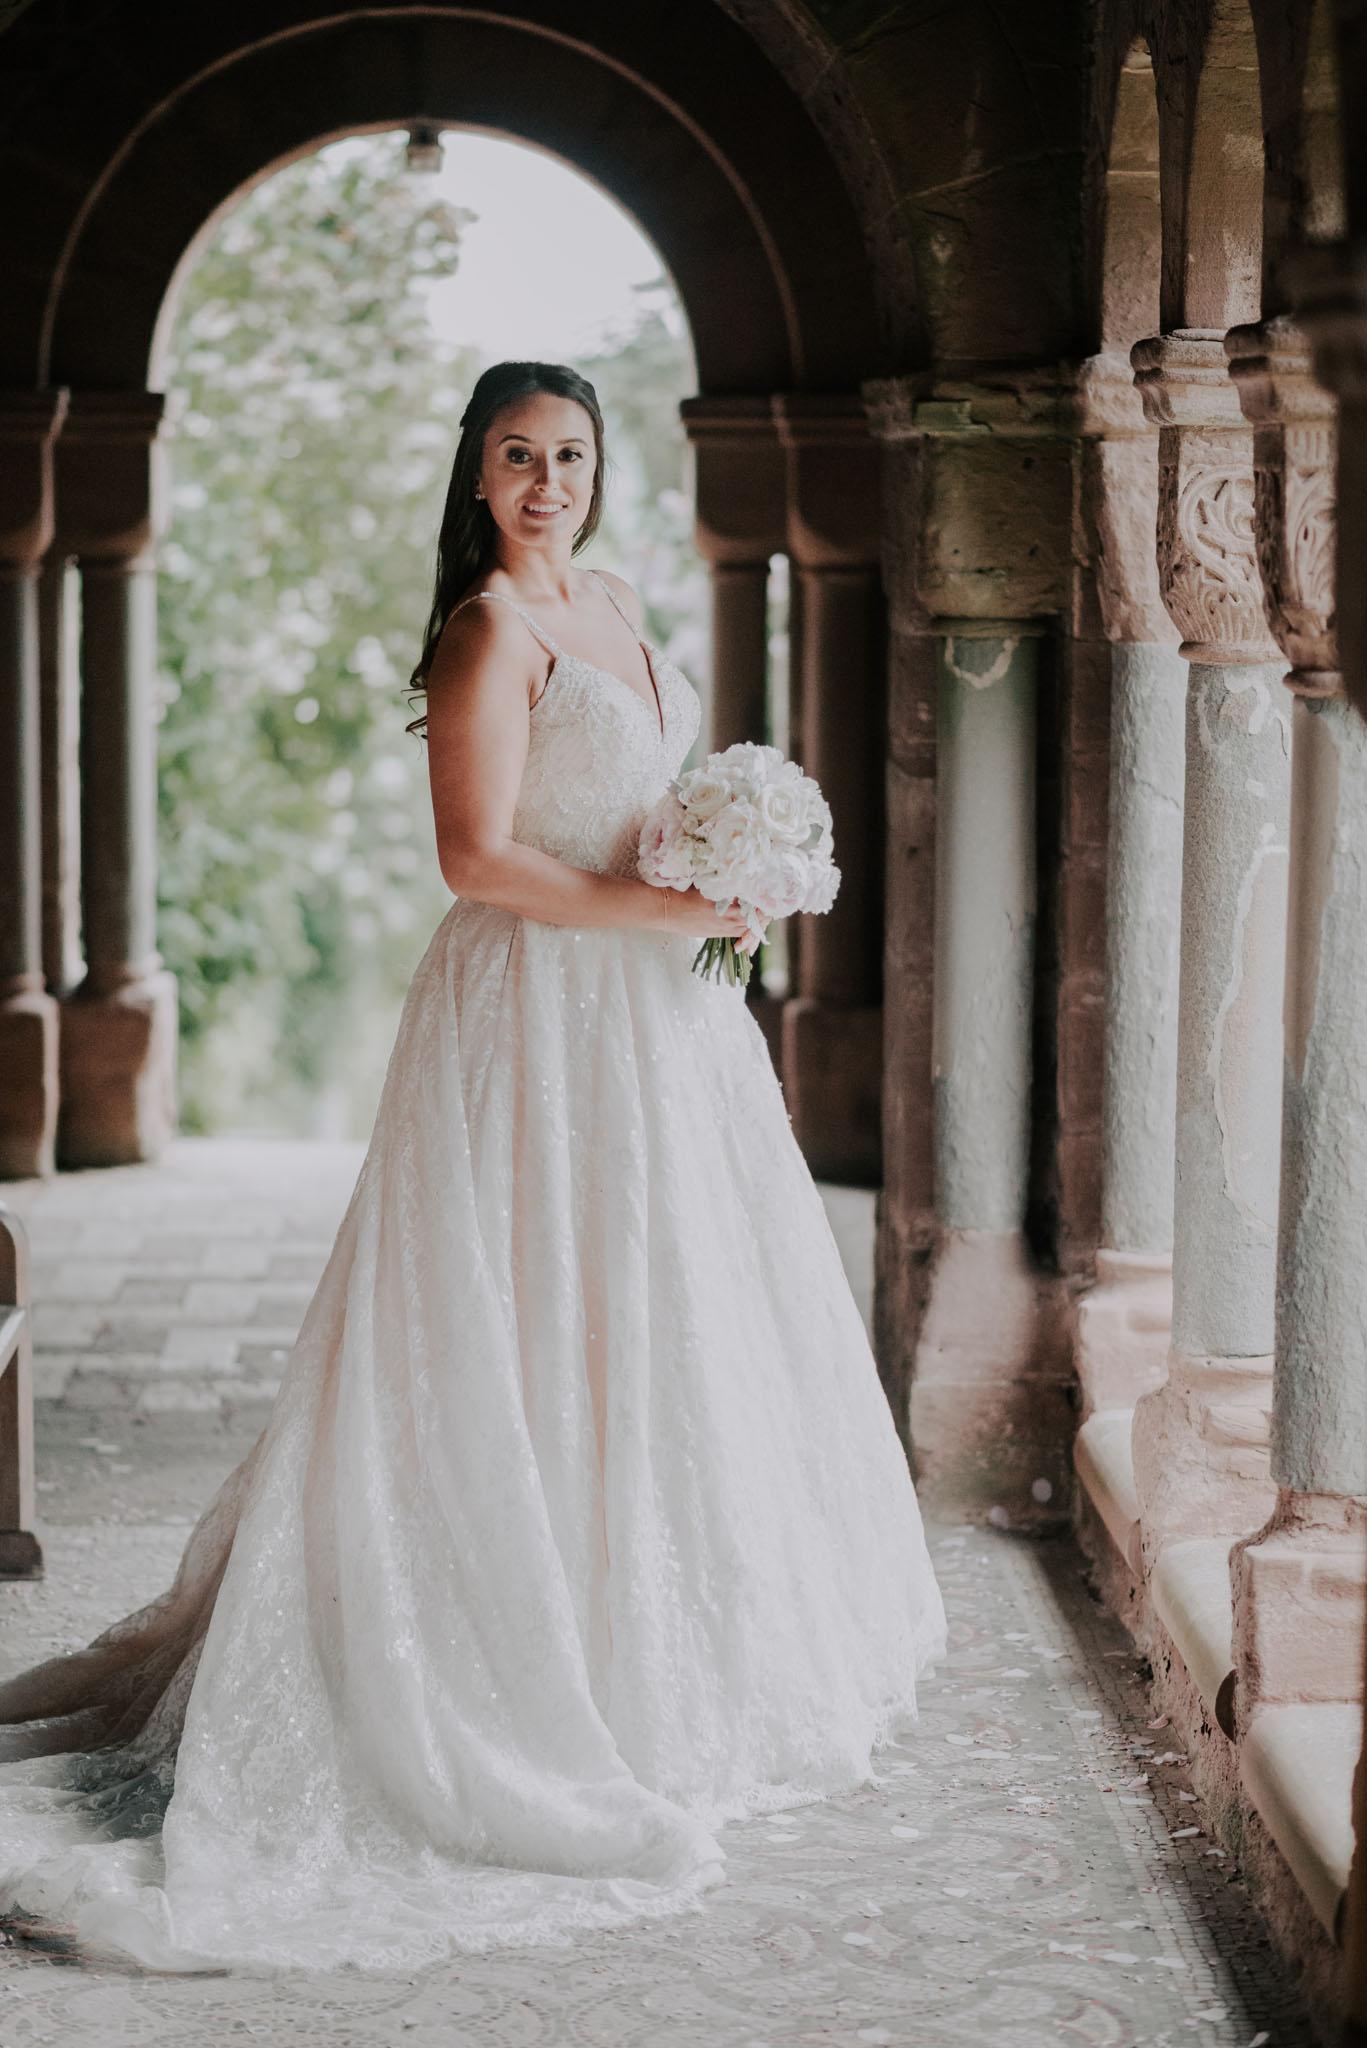 wedding-photographer-glewstone-court-hereford-scott-stockwell-photography282.jpg